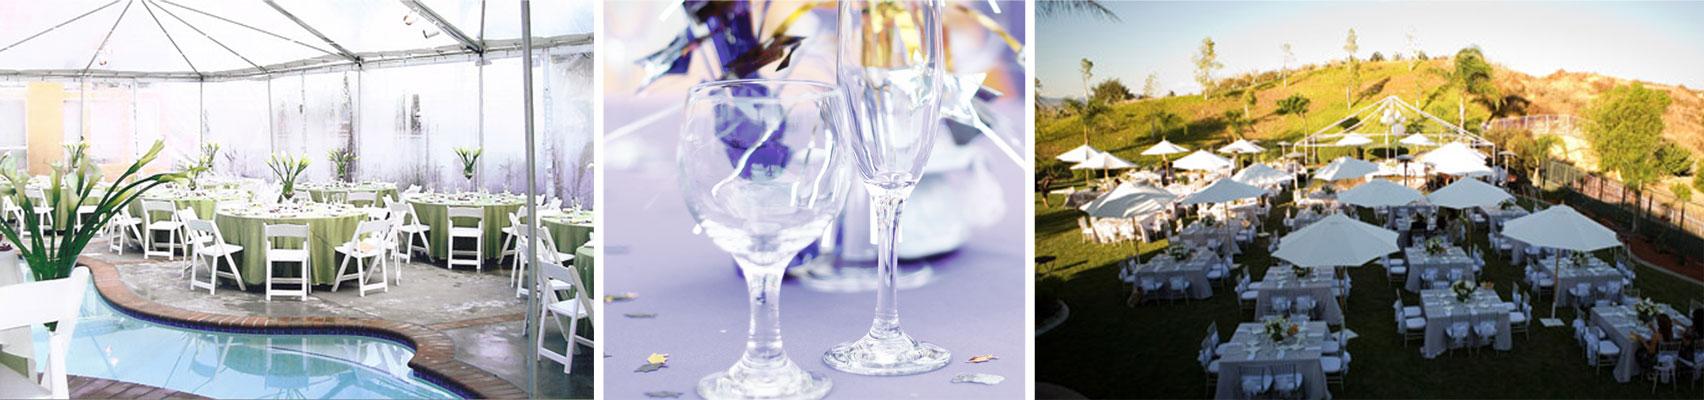 Blackburn's Catering weddings catering photos